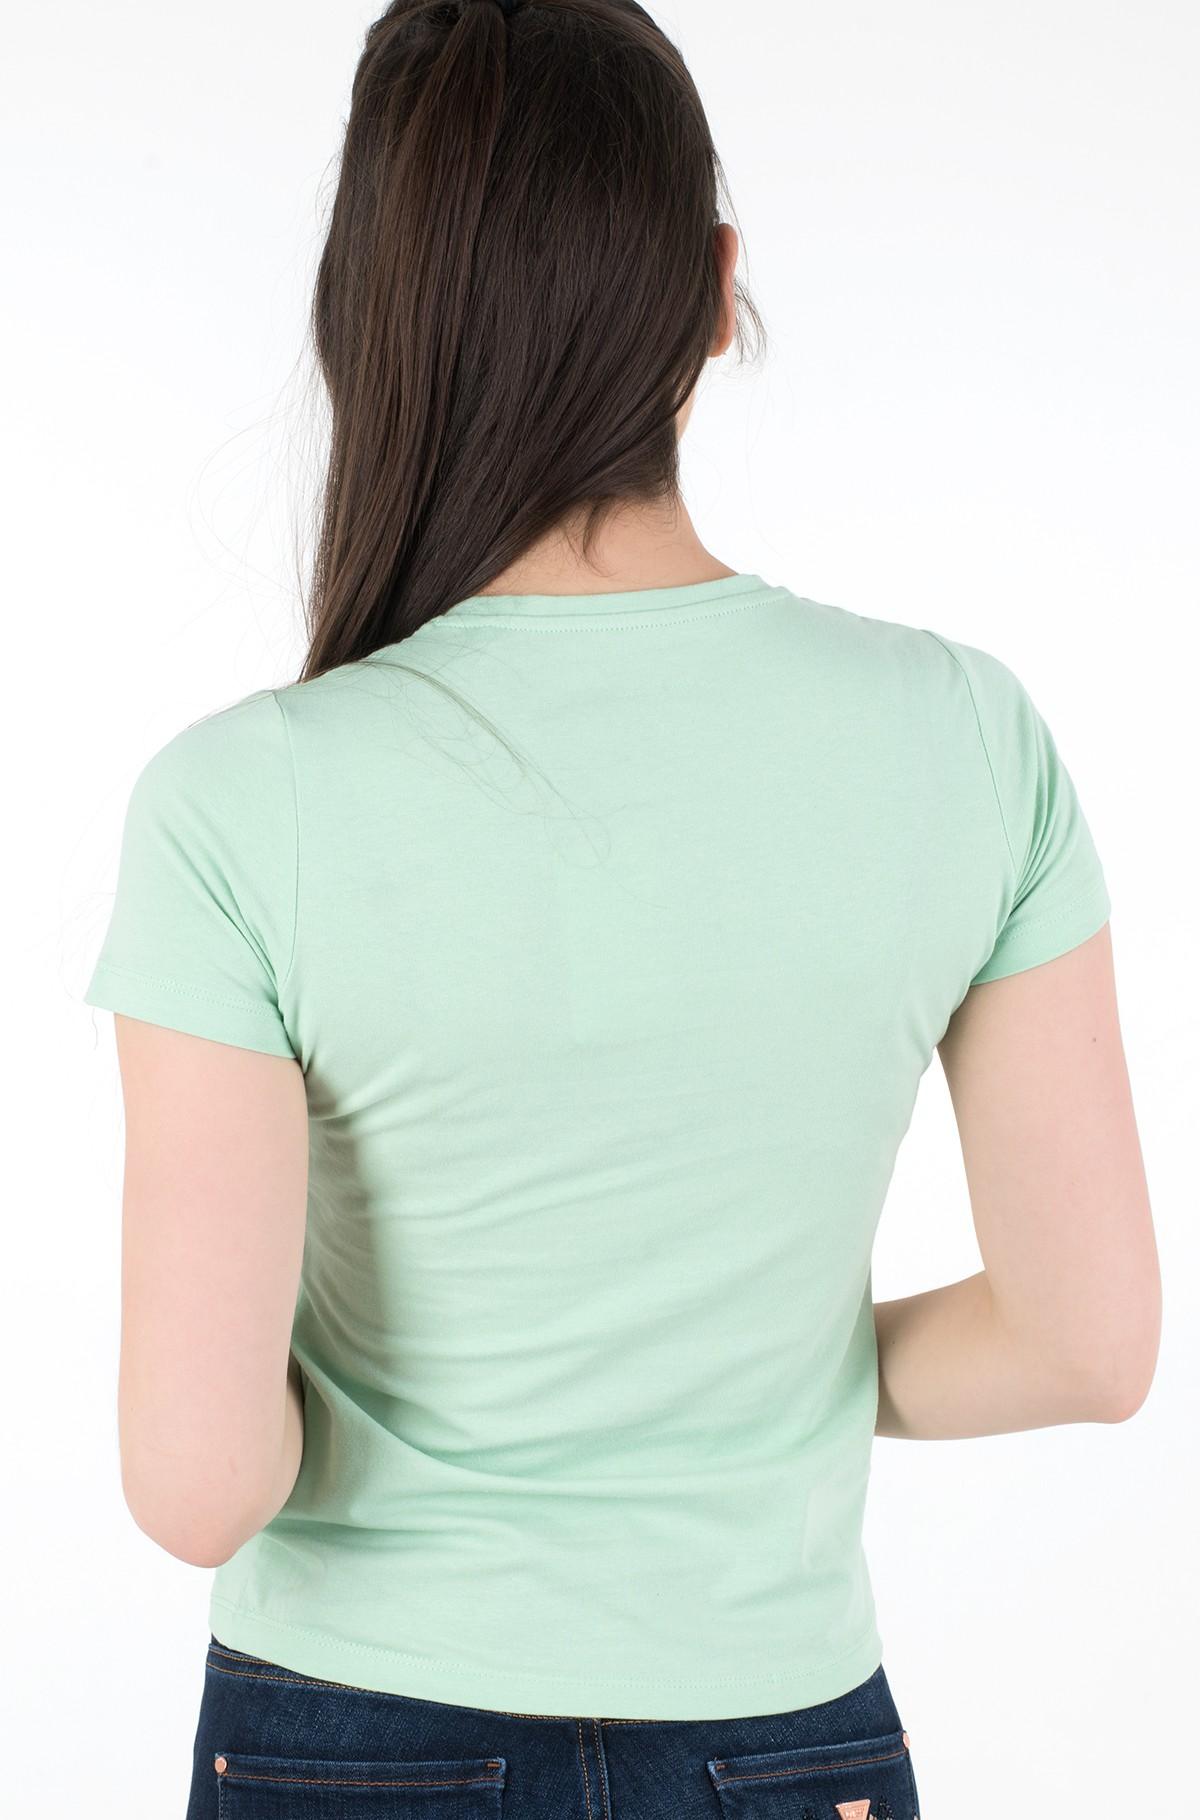 T-shirt ANNA/PL504802-full-2